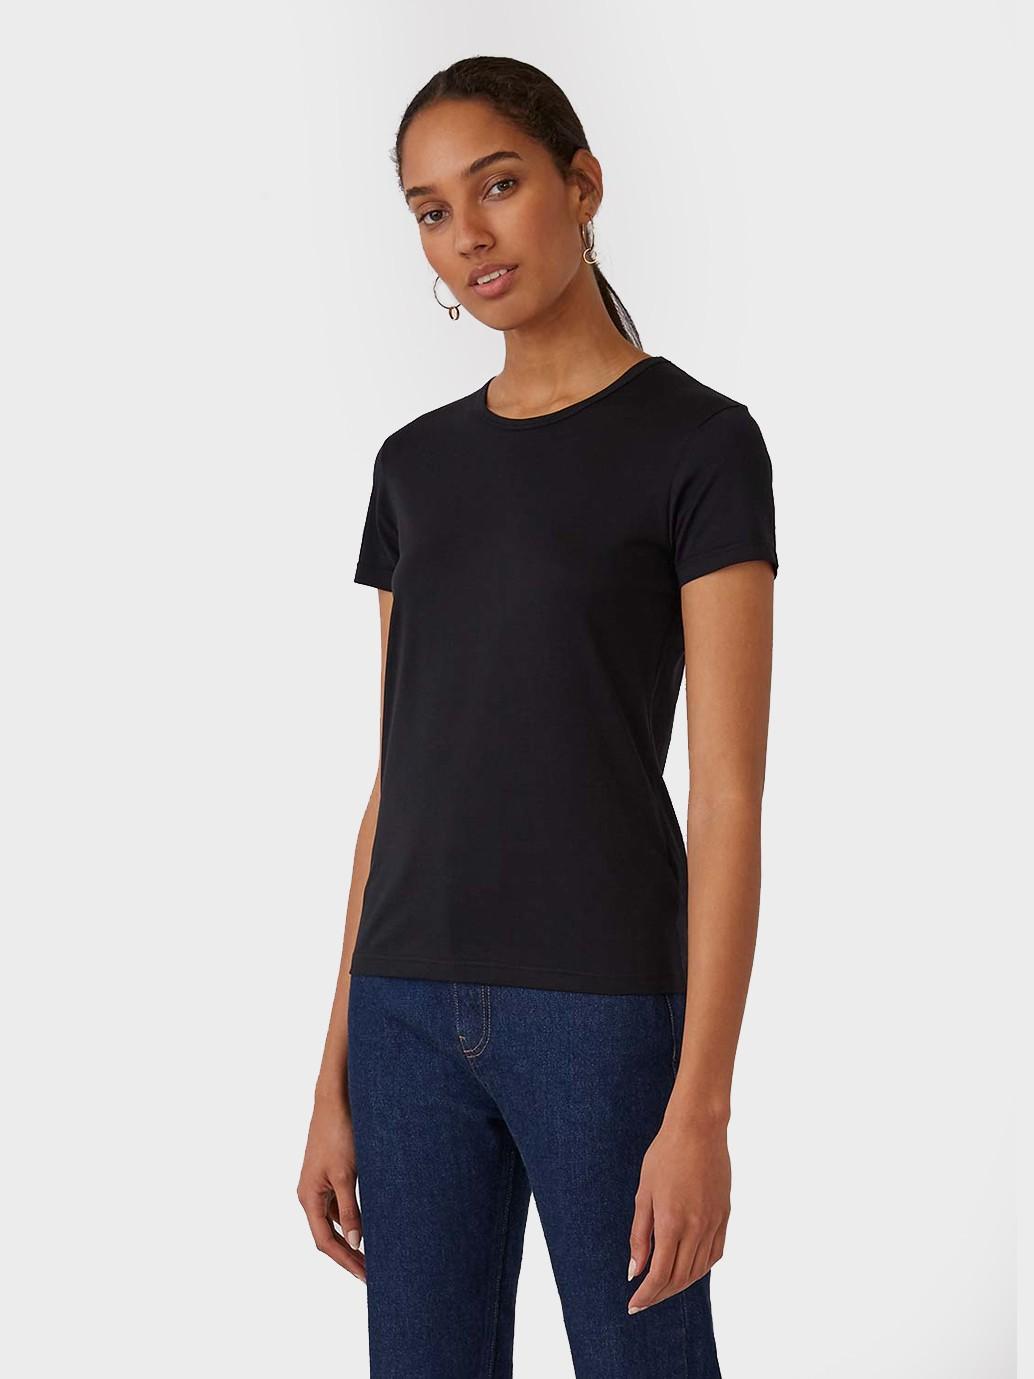 Sunspel Short Sleeve Classic Cotton T-Shirt in Black